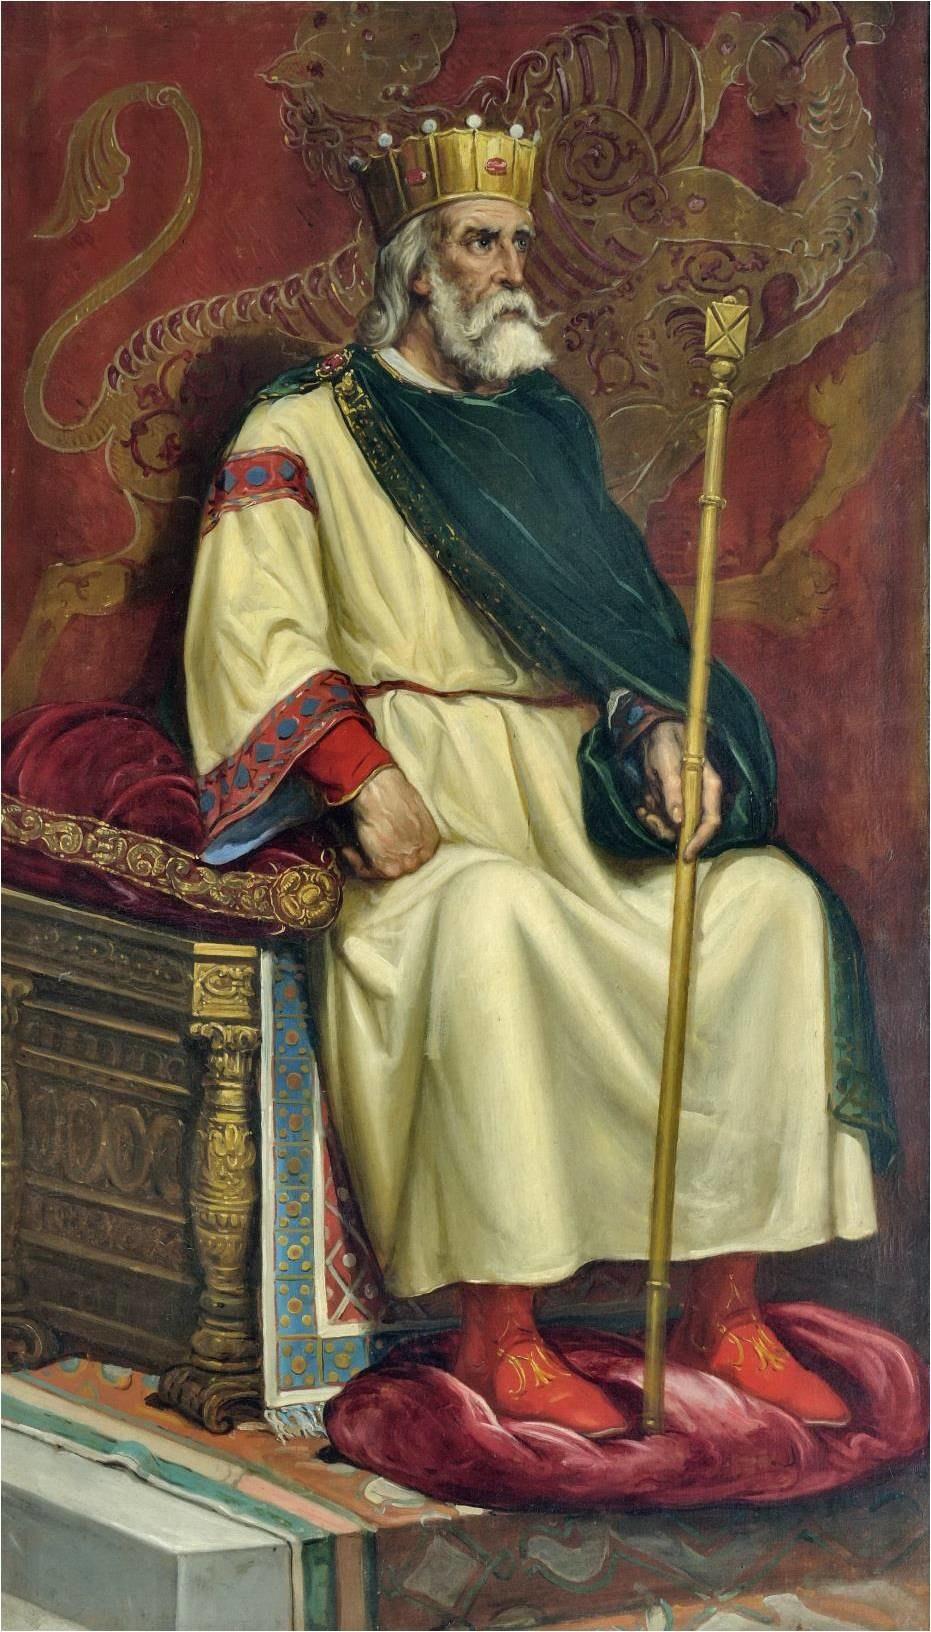 Ordoño II de León